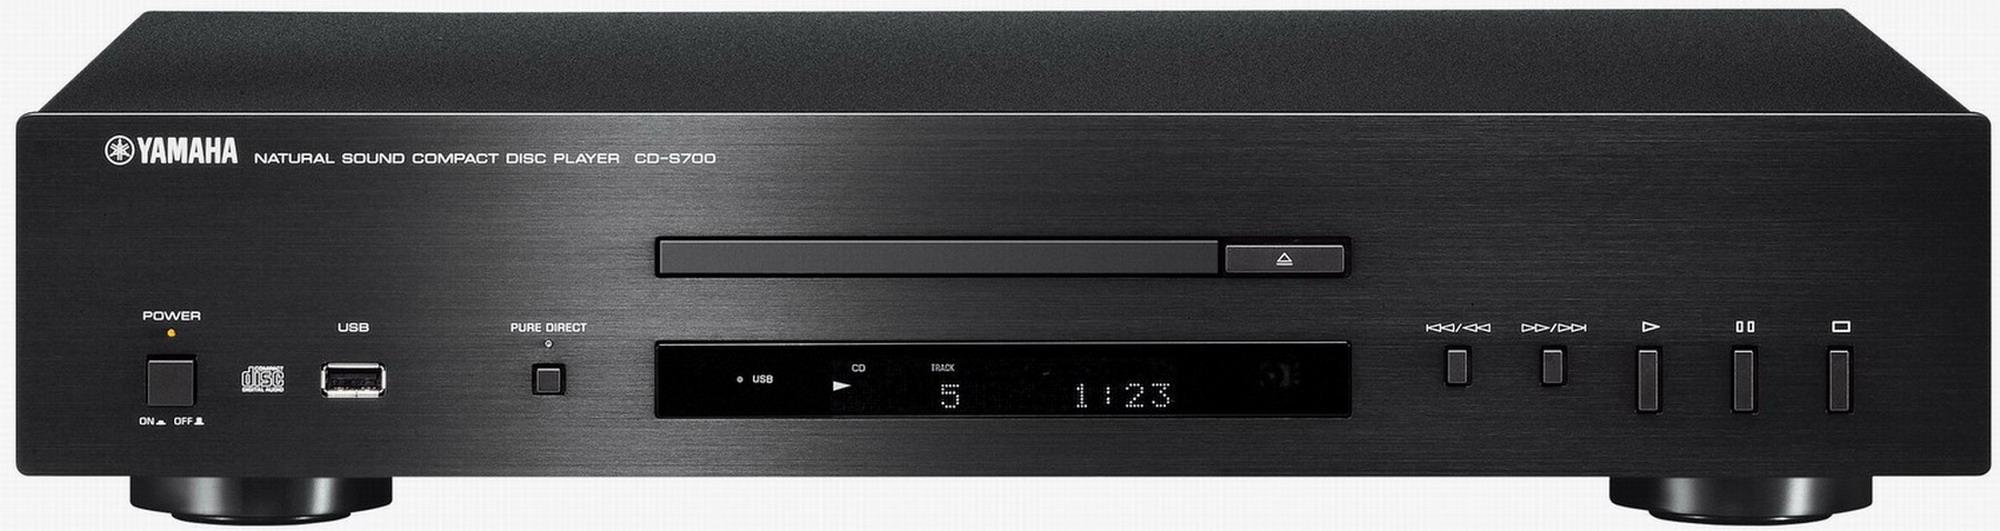 audio solutions yamaha cd s700 cd player. Black Bedroom Furniture Sets. Home Design Ideas